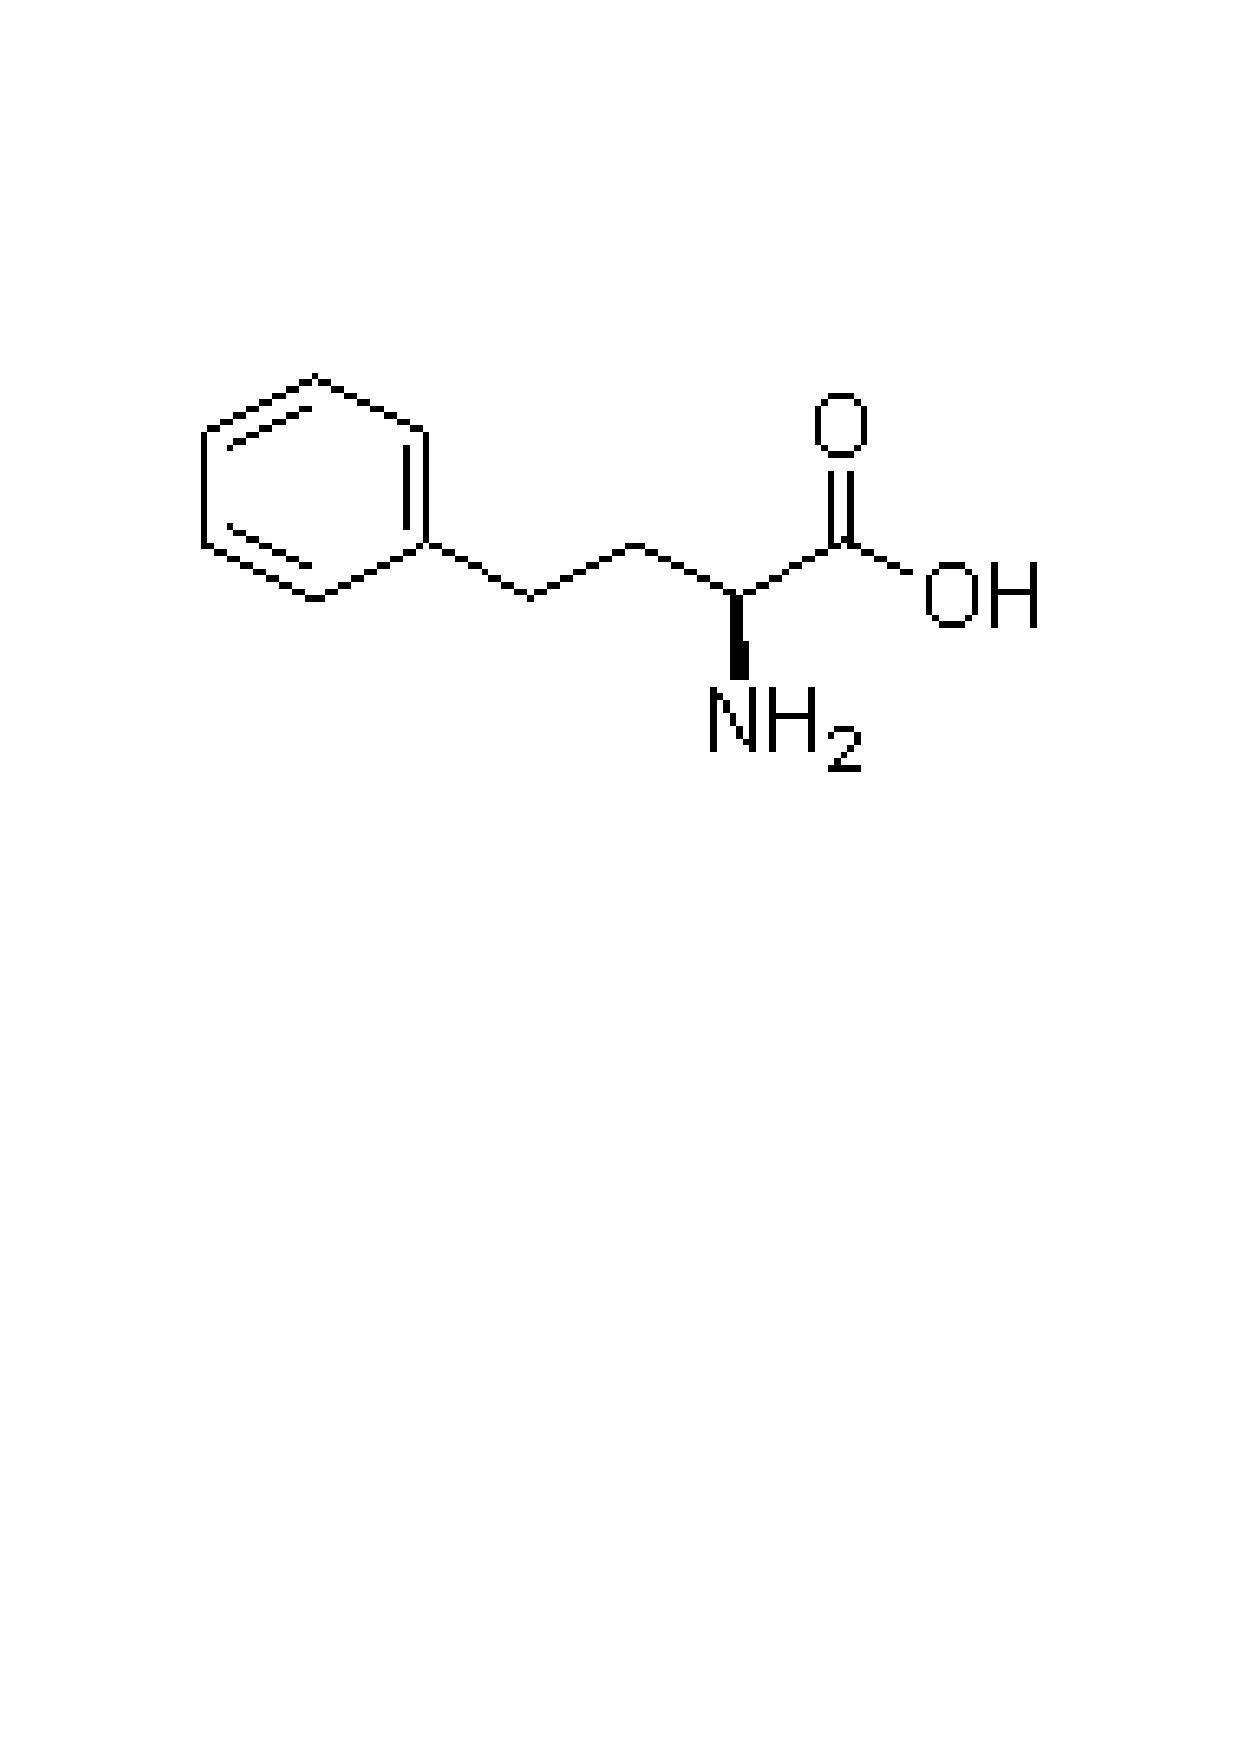 L-Homophenylalanine, cas no: 943-73-7